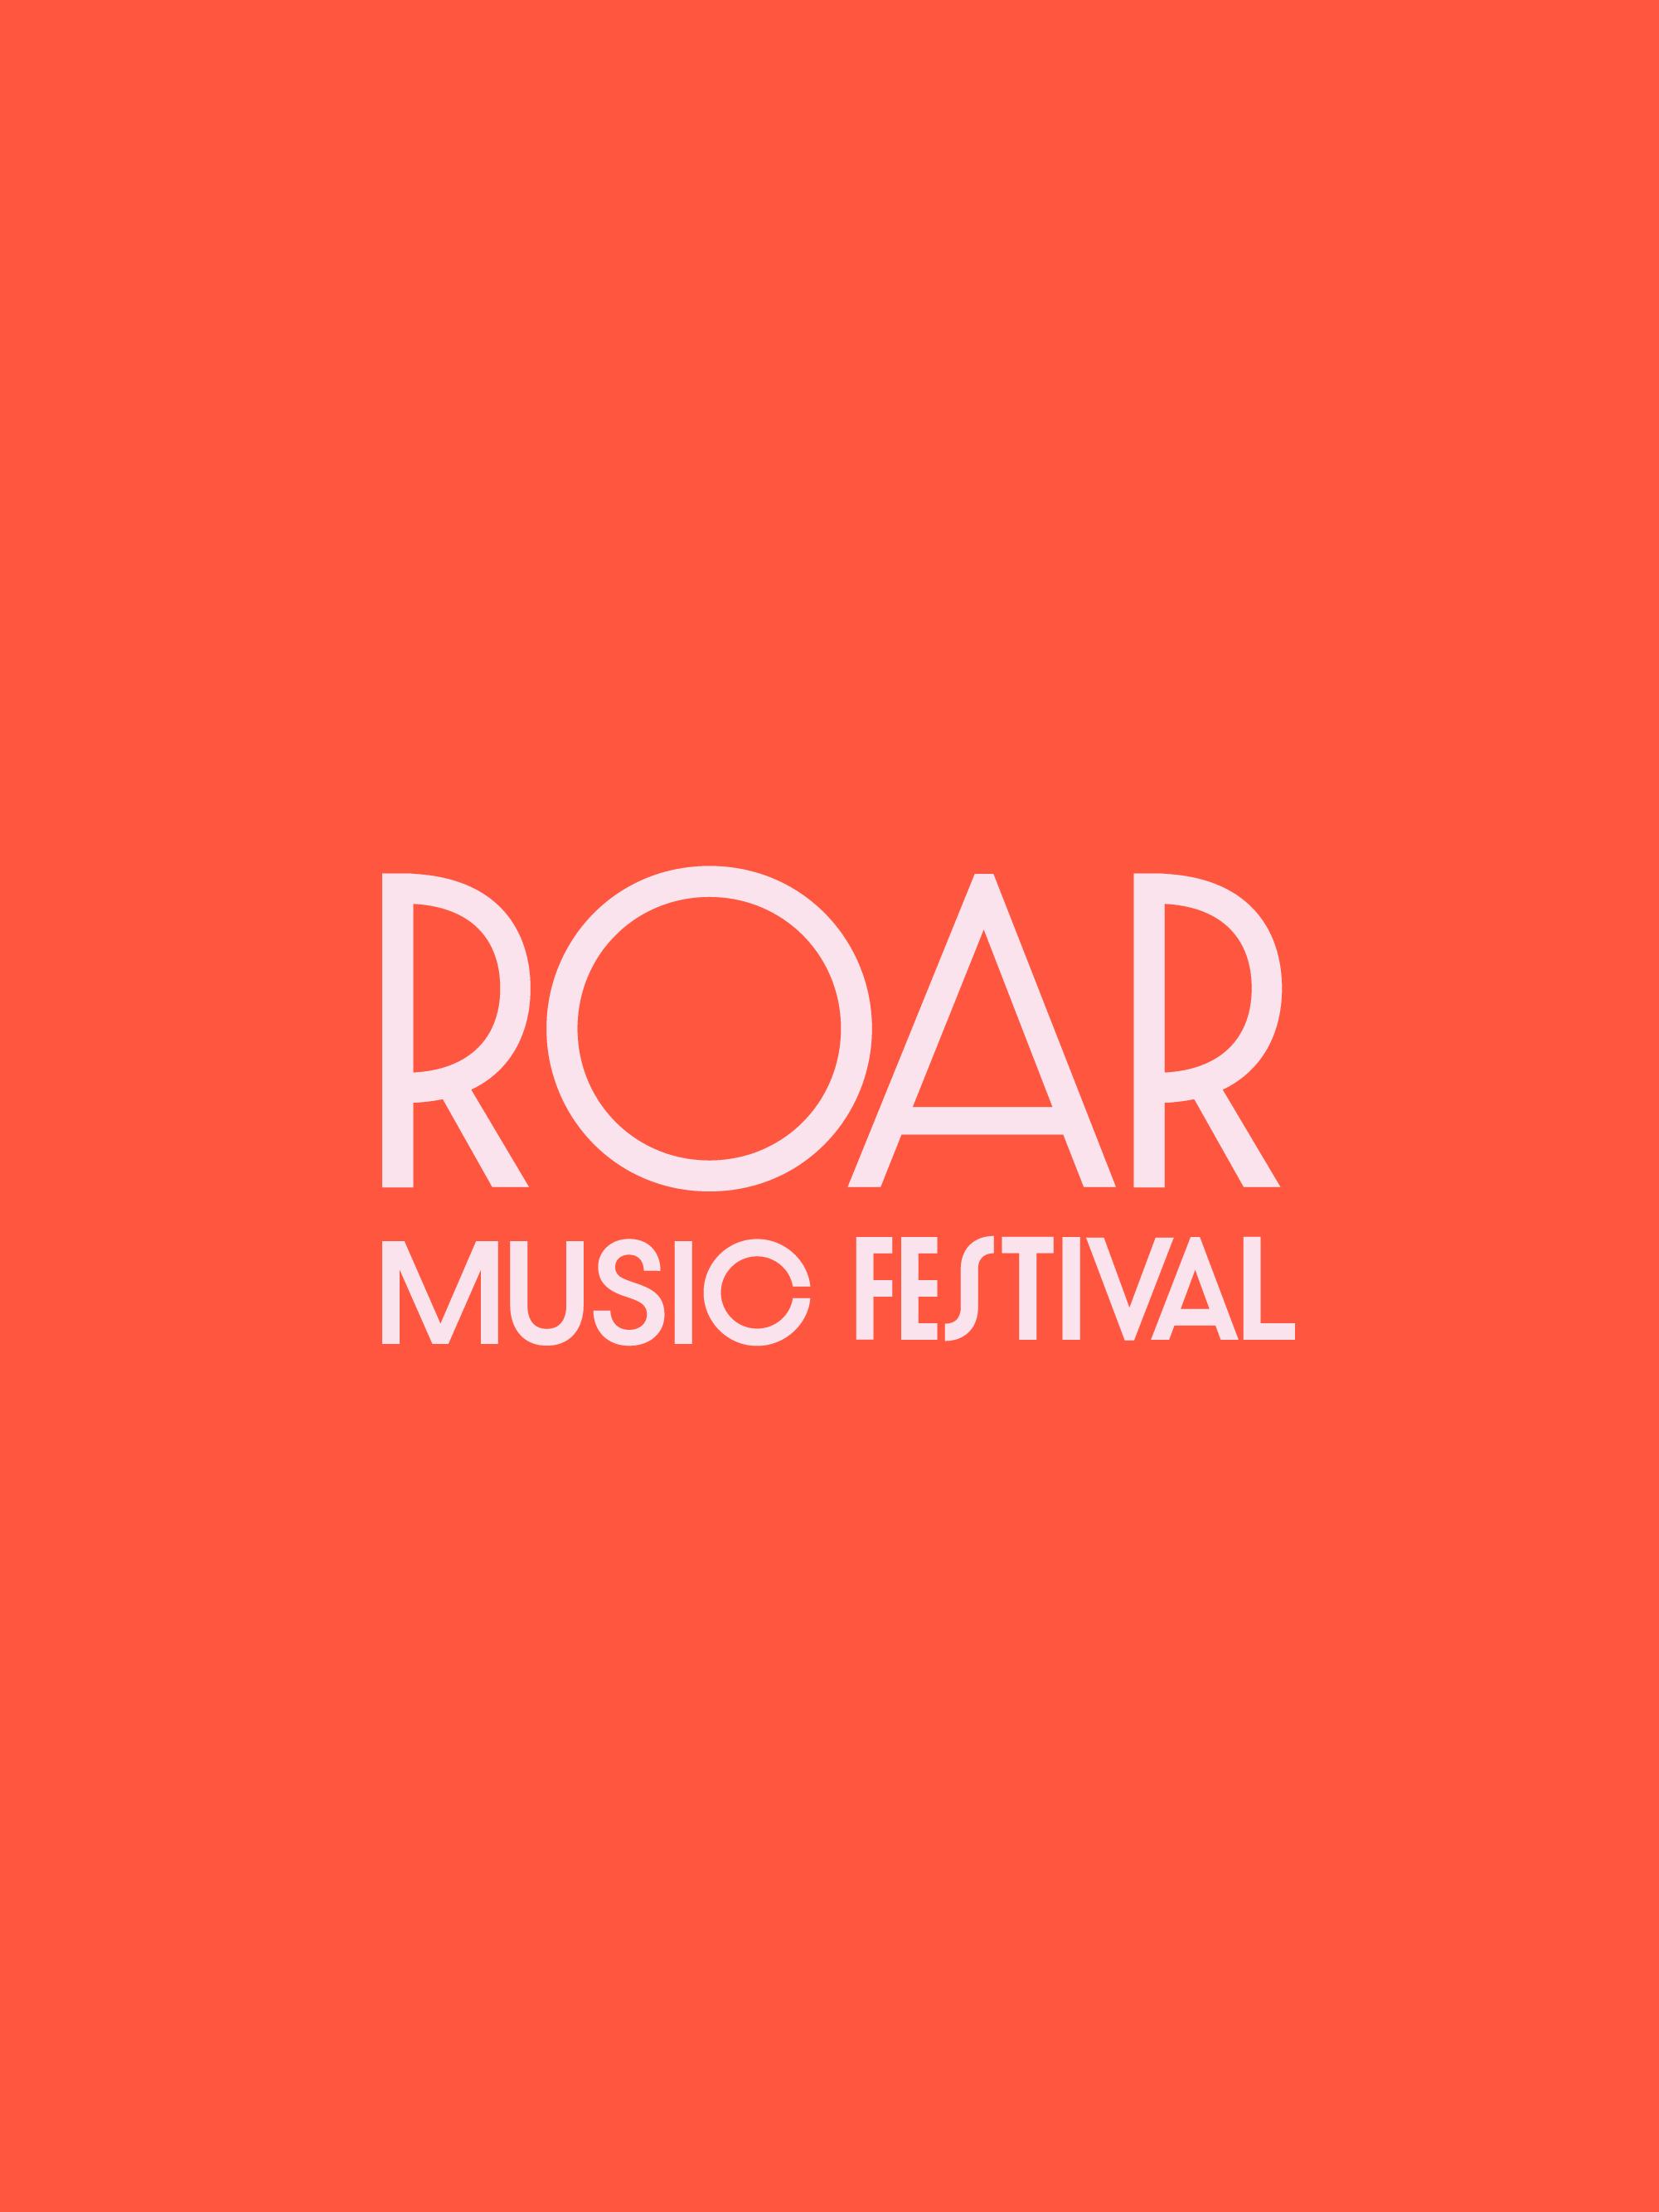 RoarFestival_WeblayoutPortfolio_27Aug2017-02-min.png